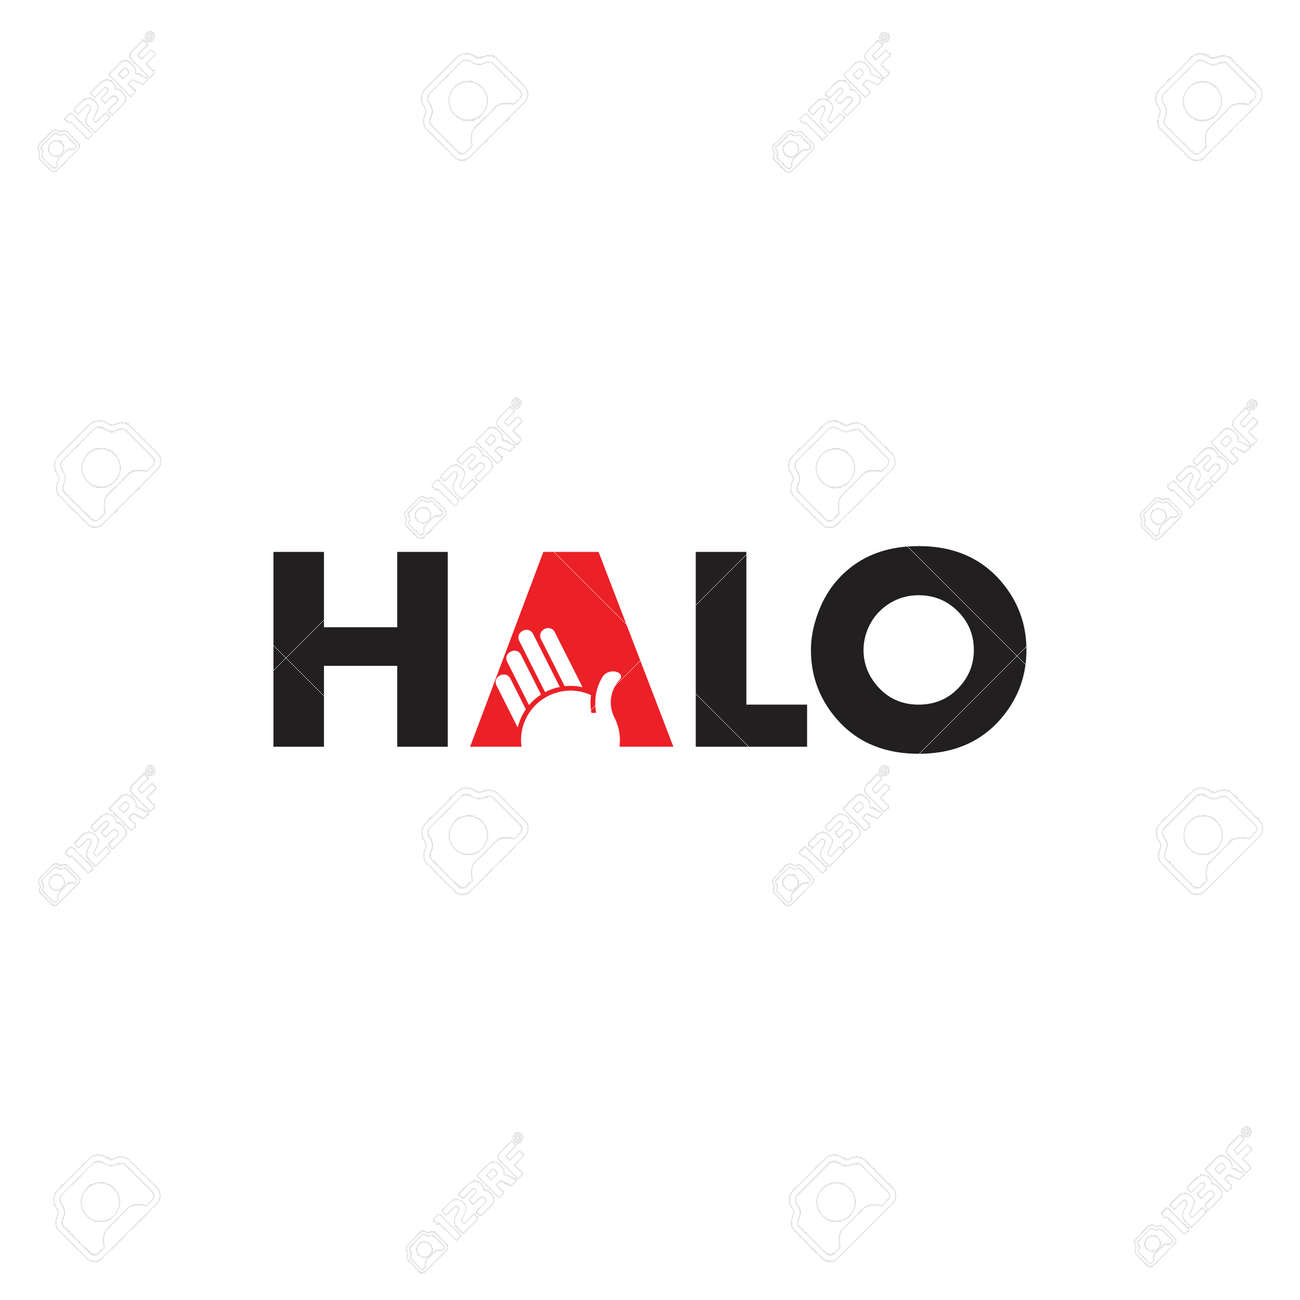 text halo hand symbol logo vector - 127843291